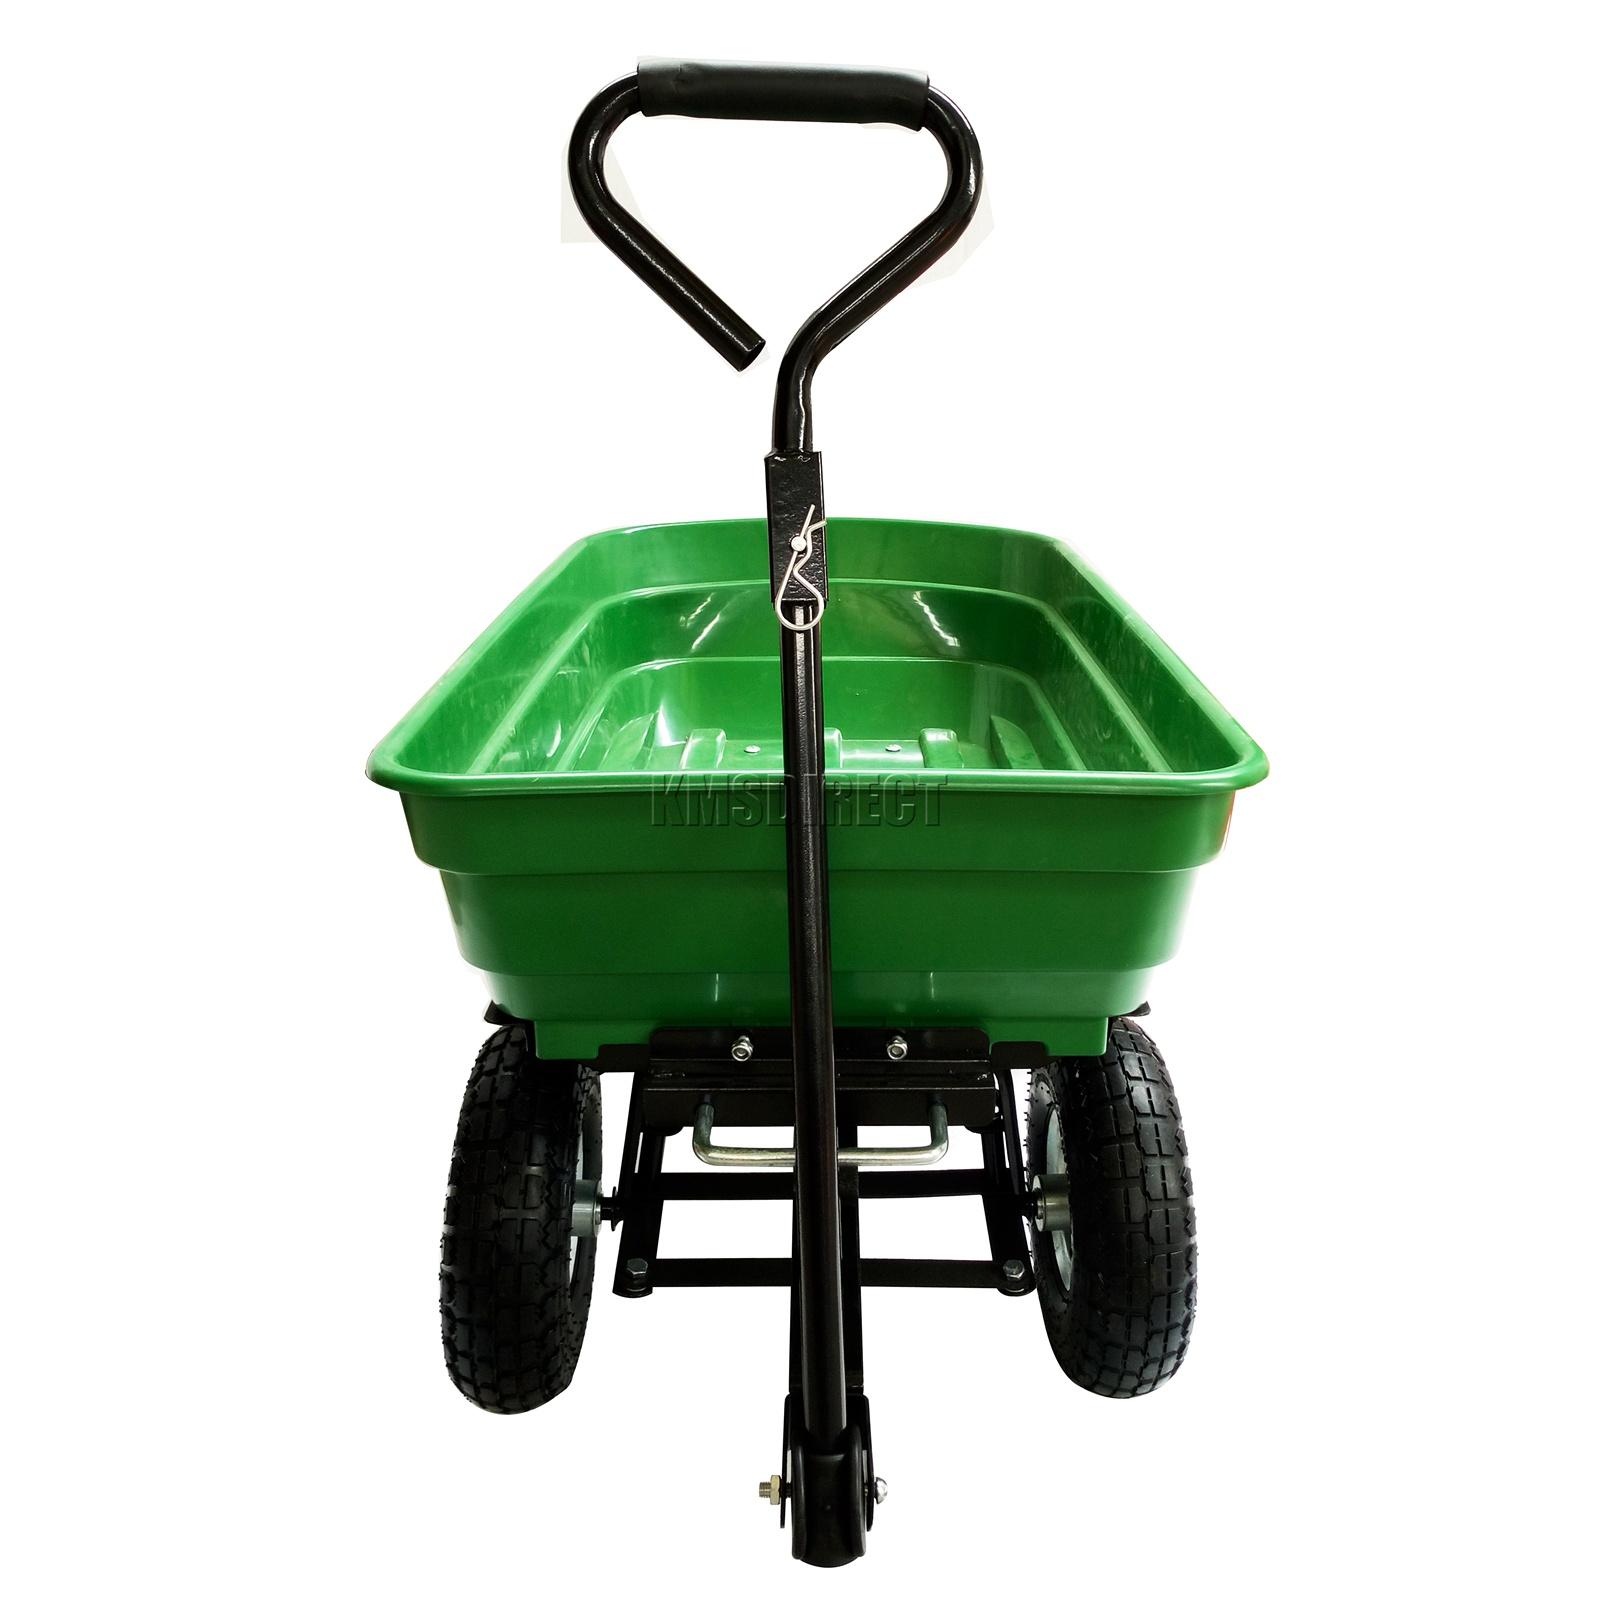 FoxHunter-Heavy-Duty-Garden-Dump-Truck-Tipping-Trailer-Trolley-Cart-Wheelbarrow miniatuur 34